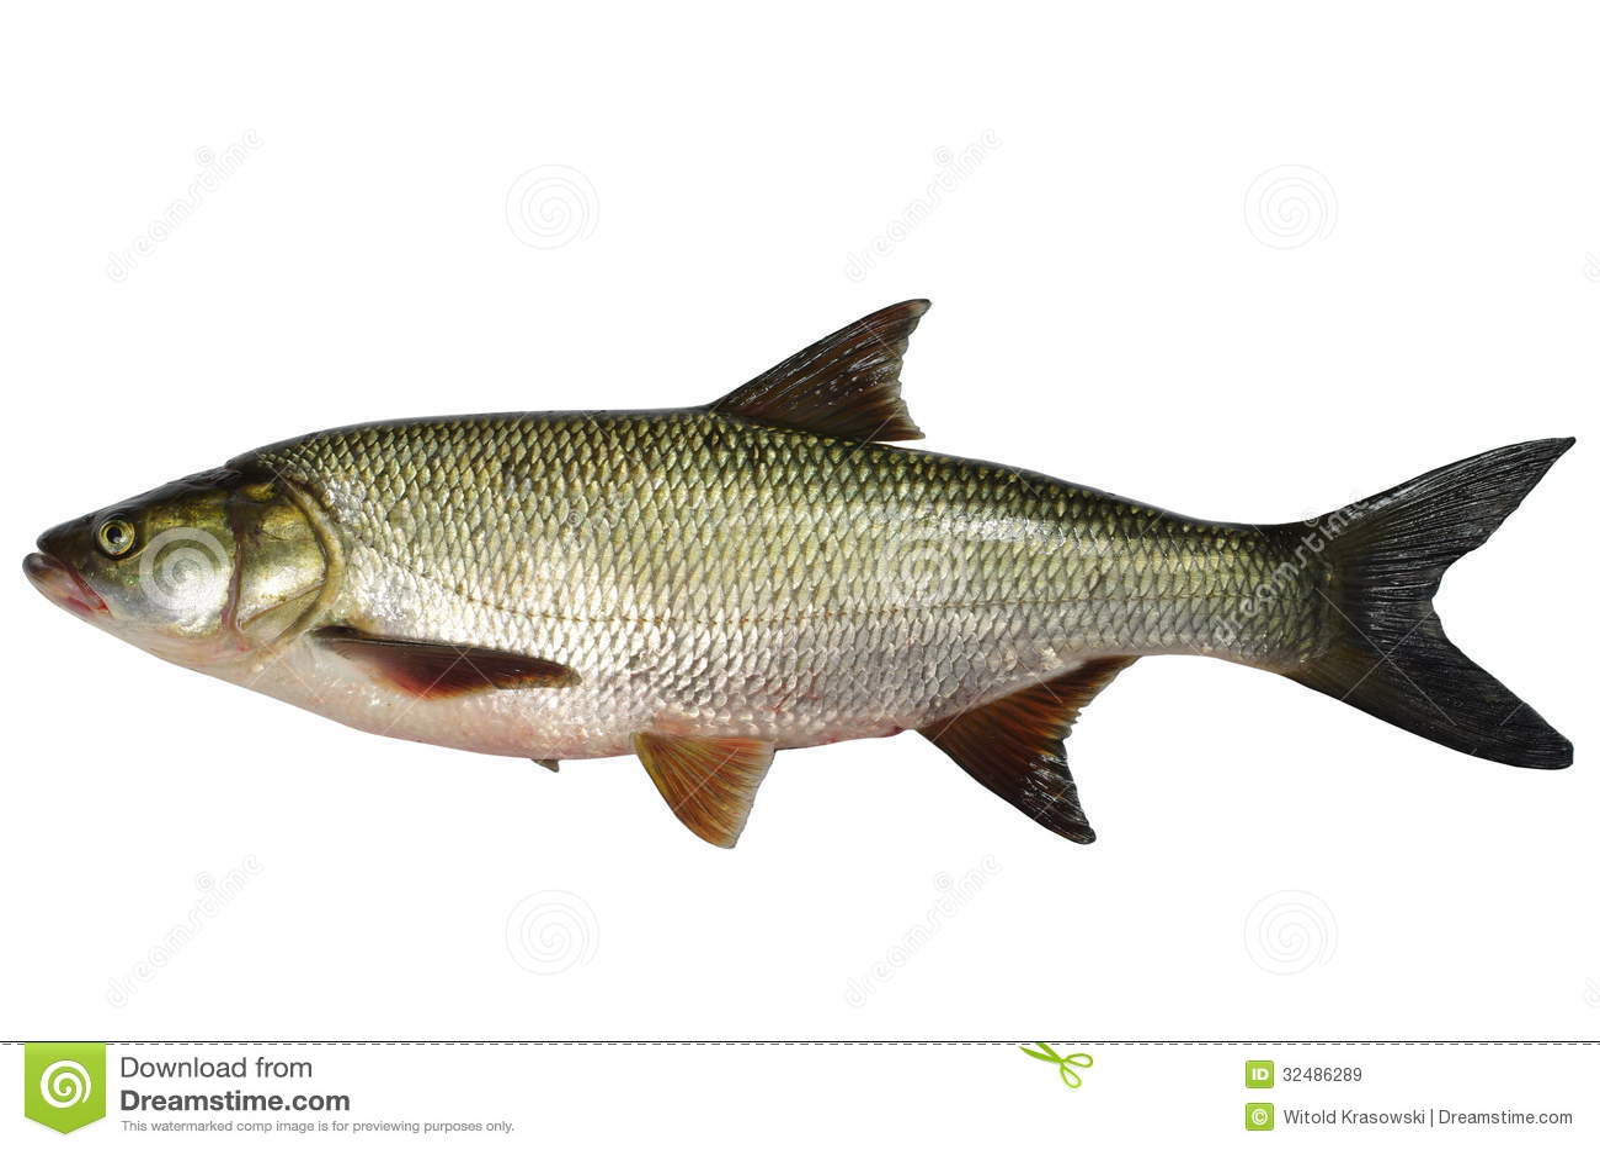 Asp predatory fish royalty free stock images image 32486289 for Predatory freshwater fish